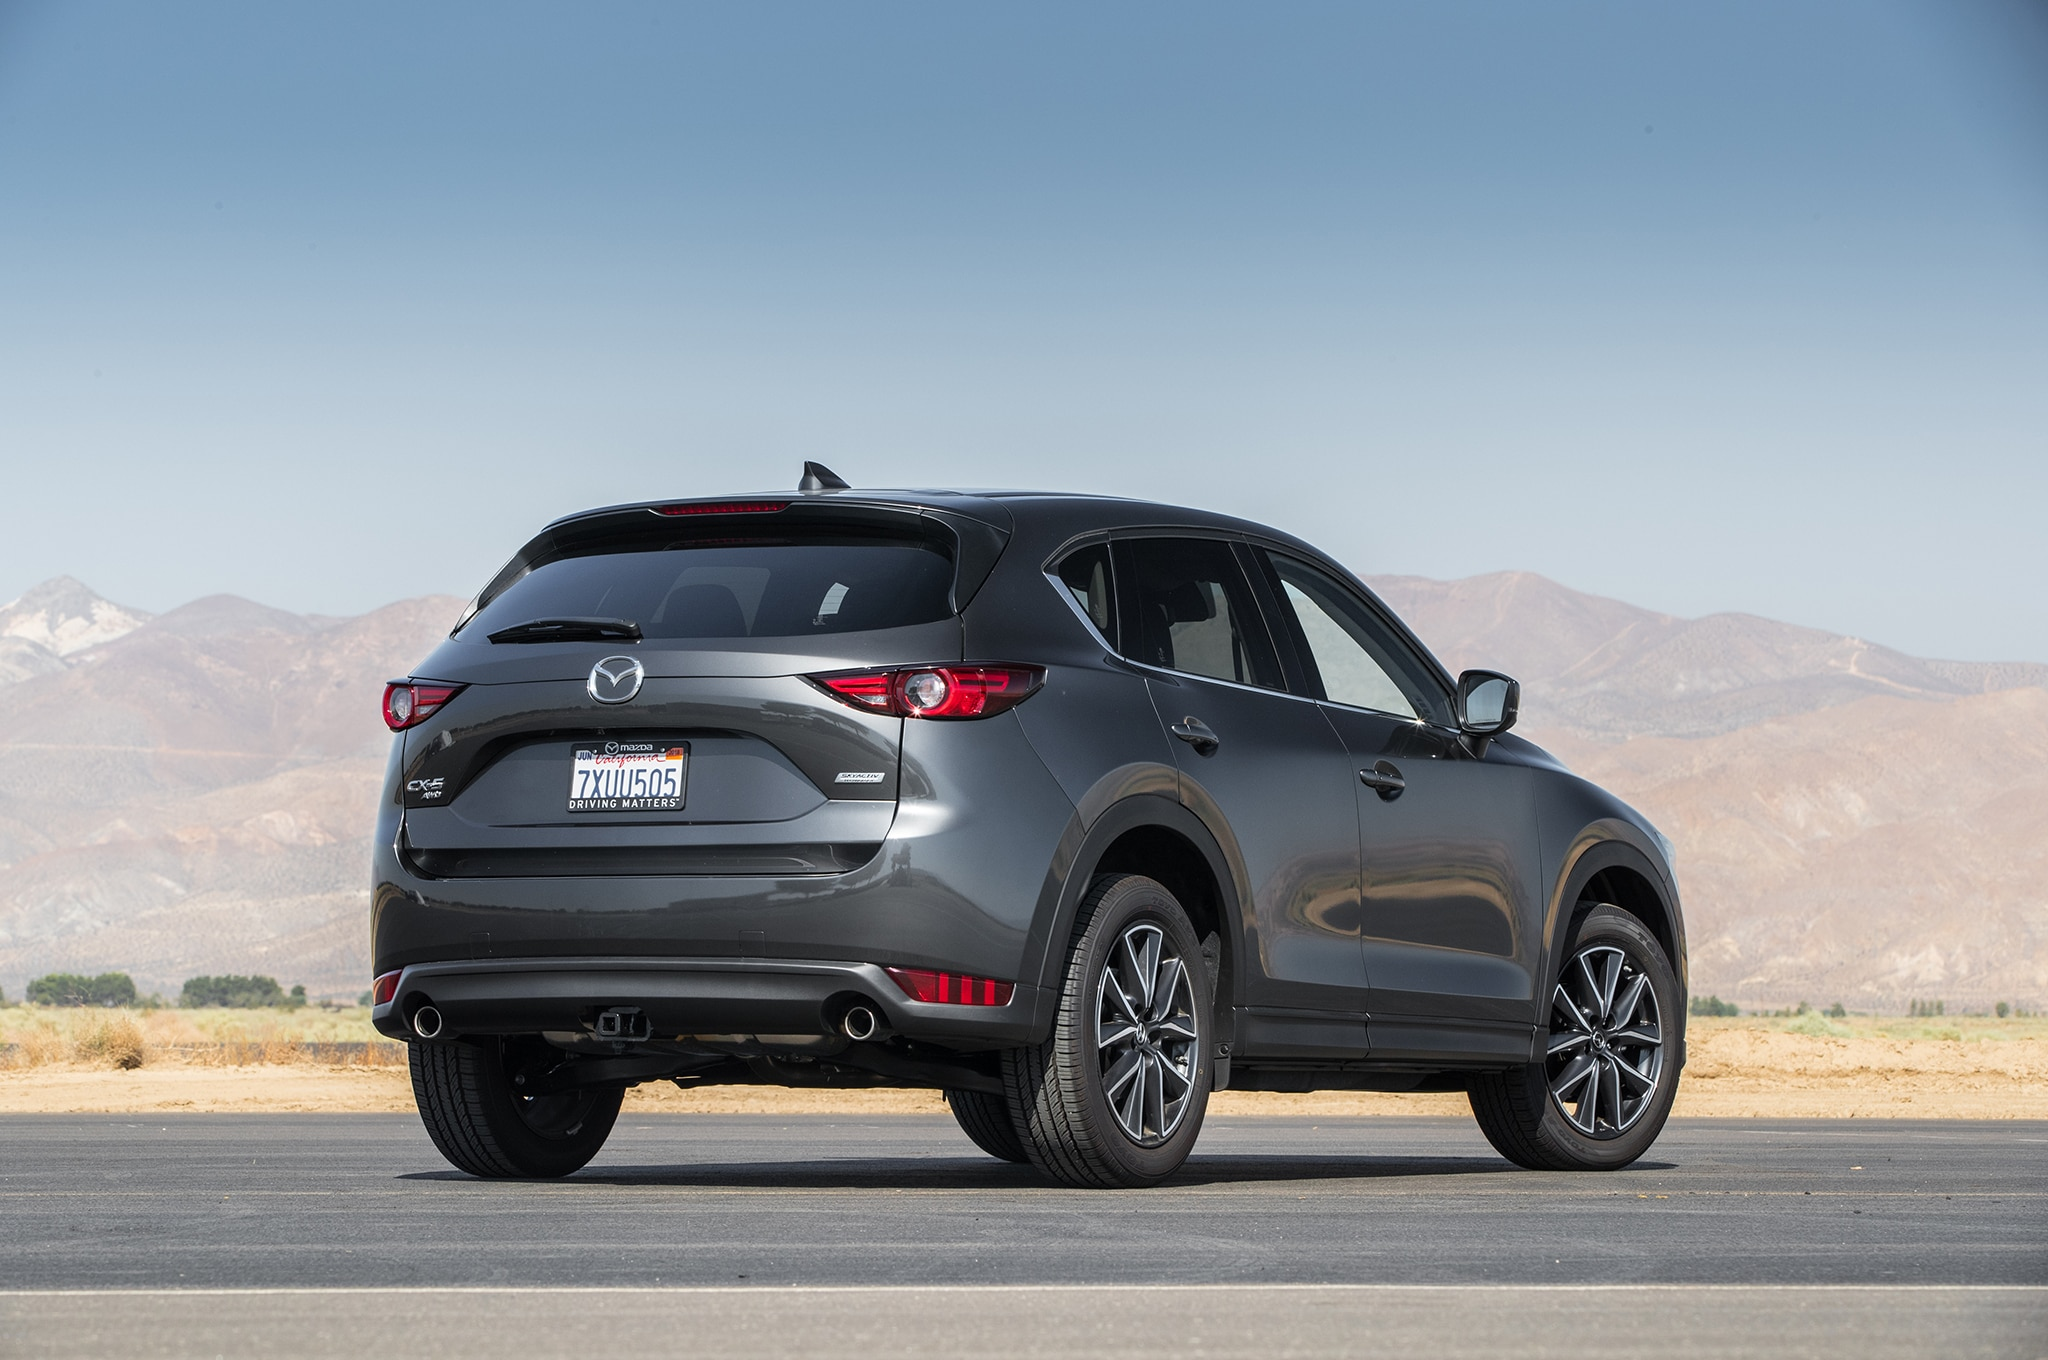 2018 Mazda CX-5 Gets Cylinder Deactivation | Automobile ...